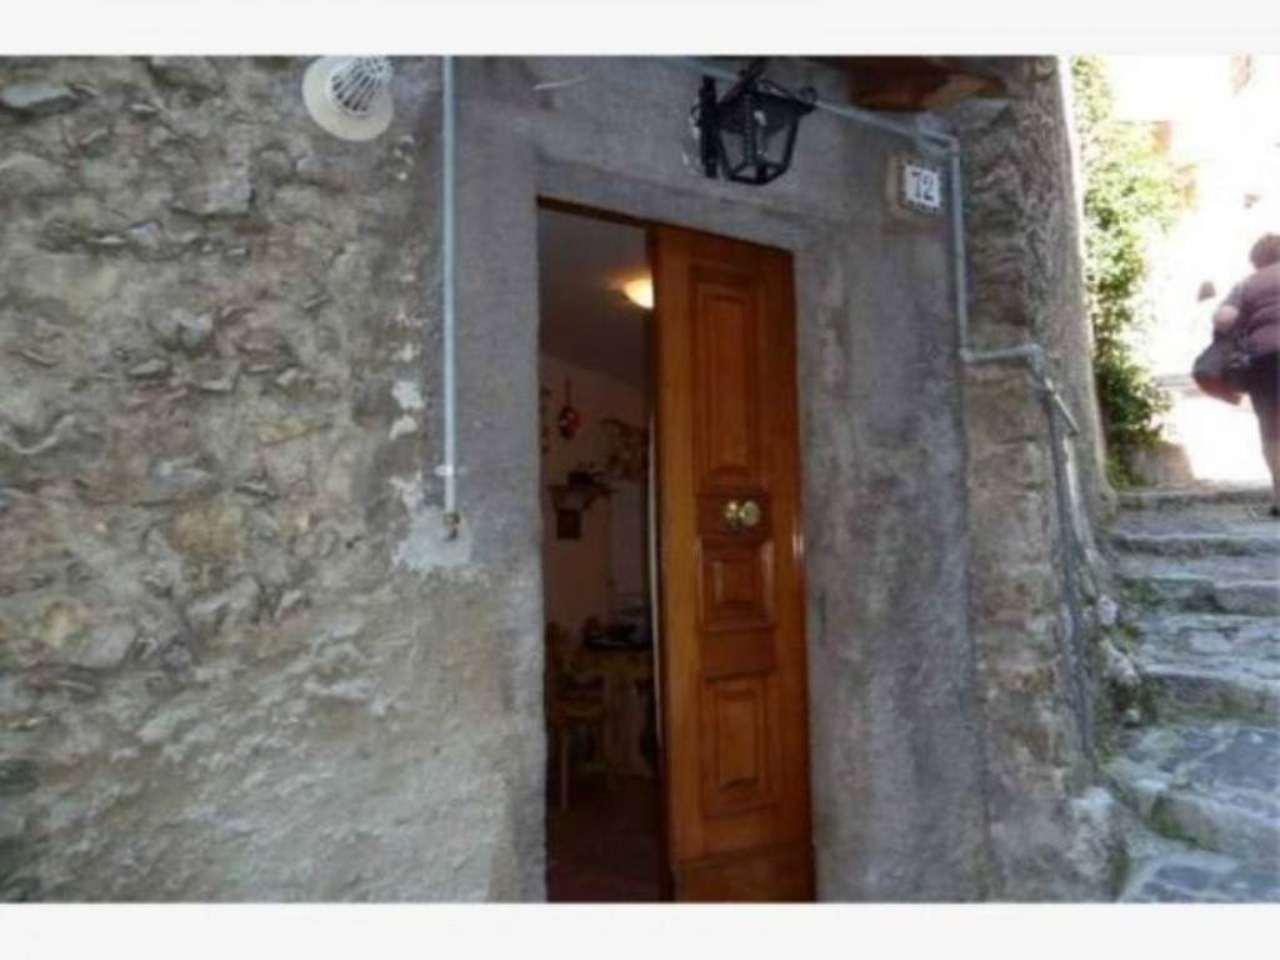 Bilocale Carsoli Via San Nicola 72 8